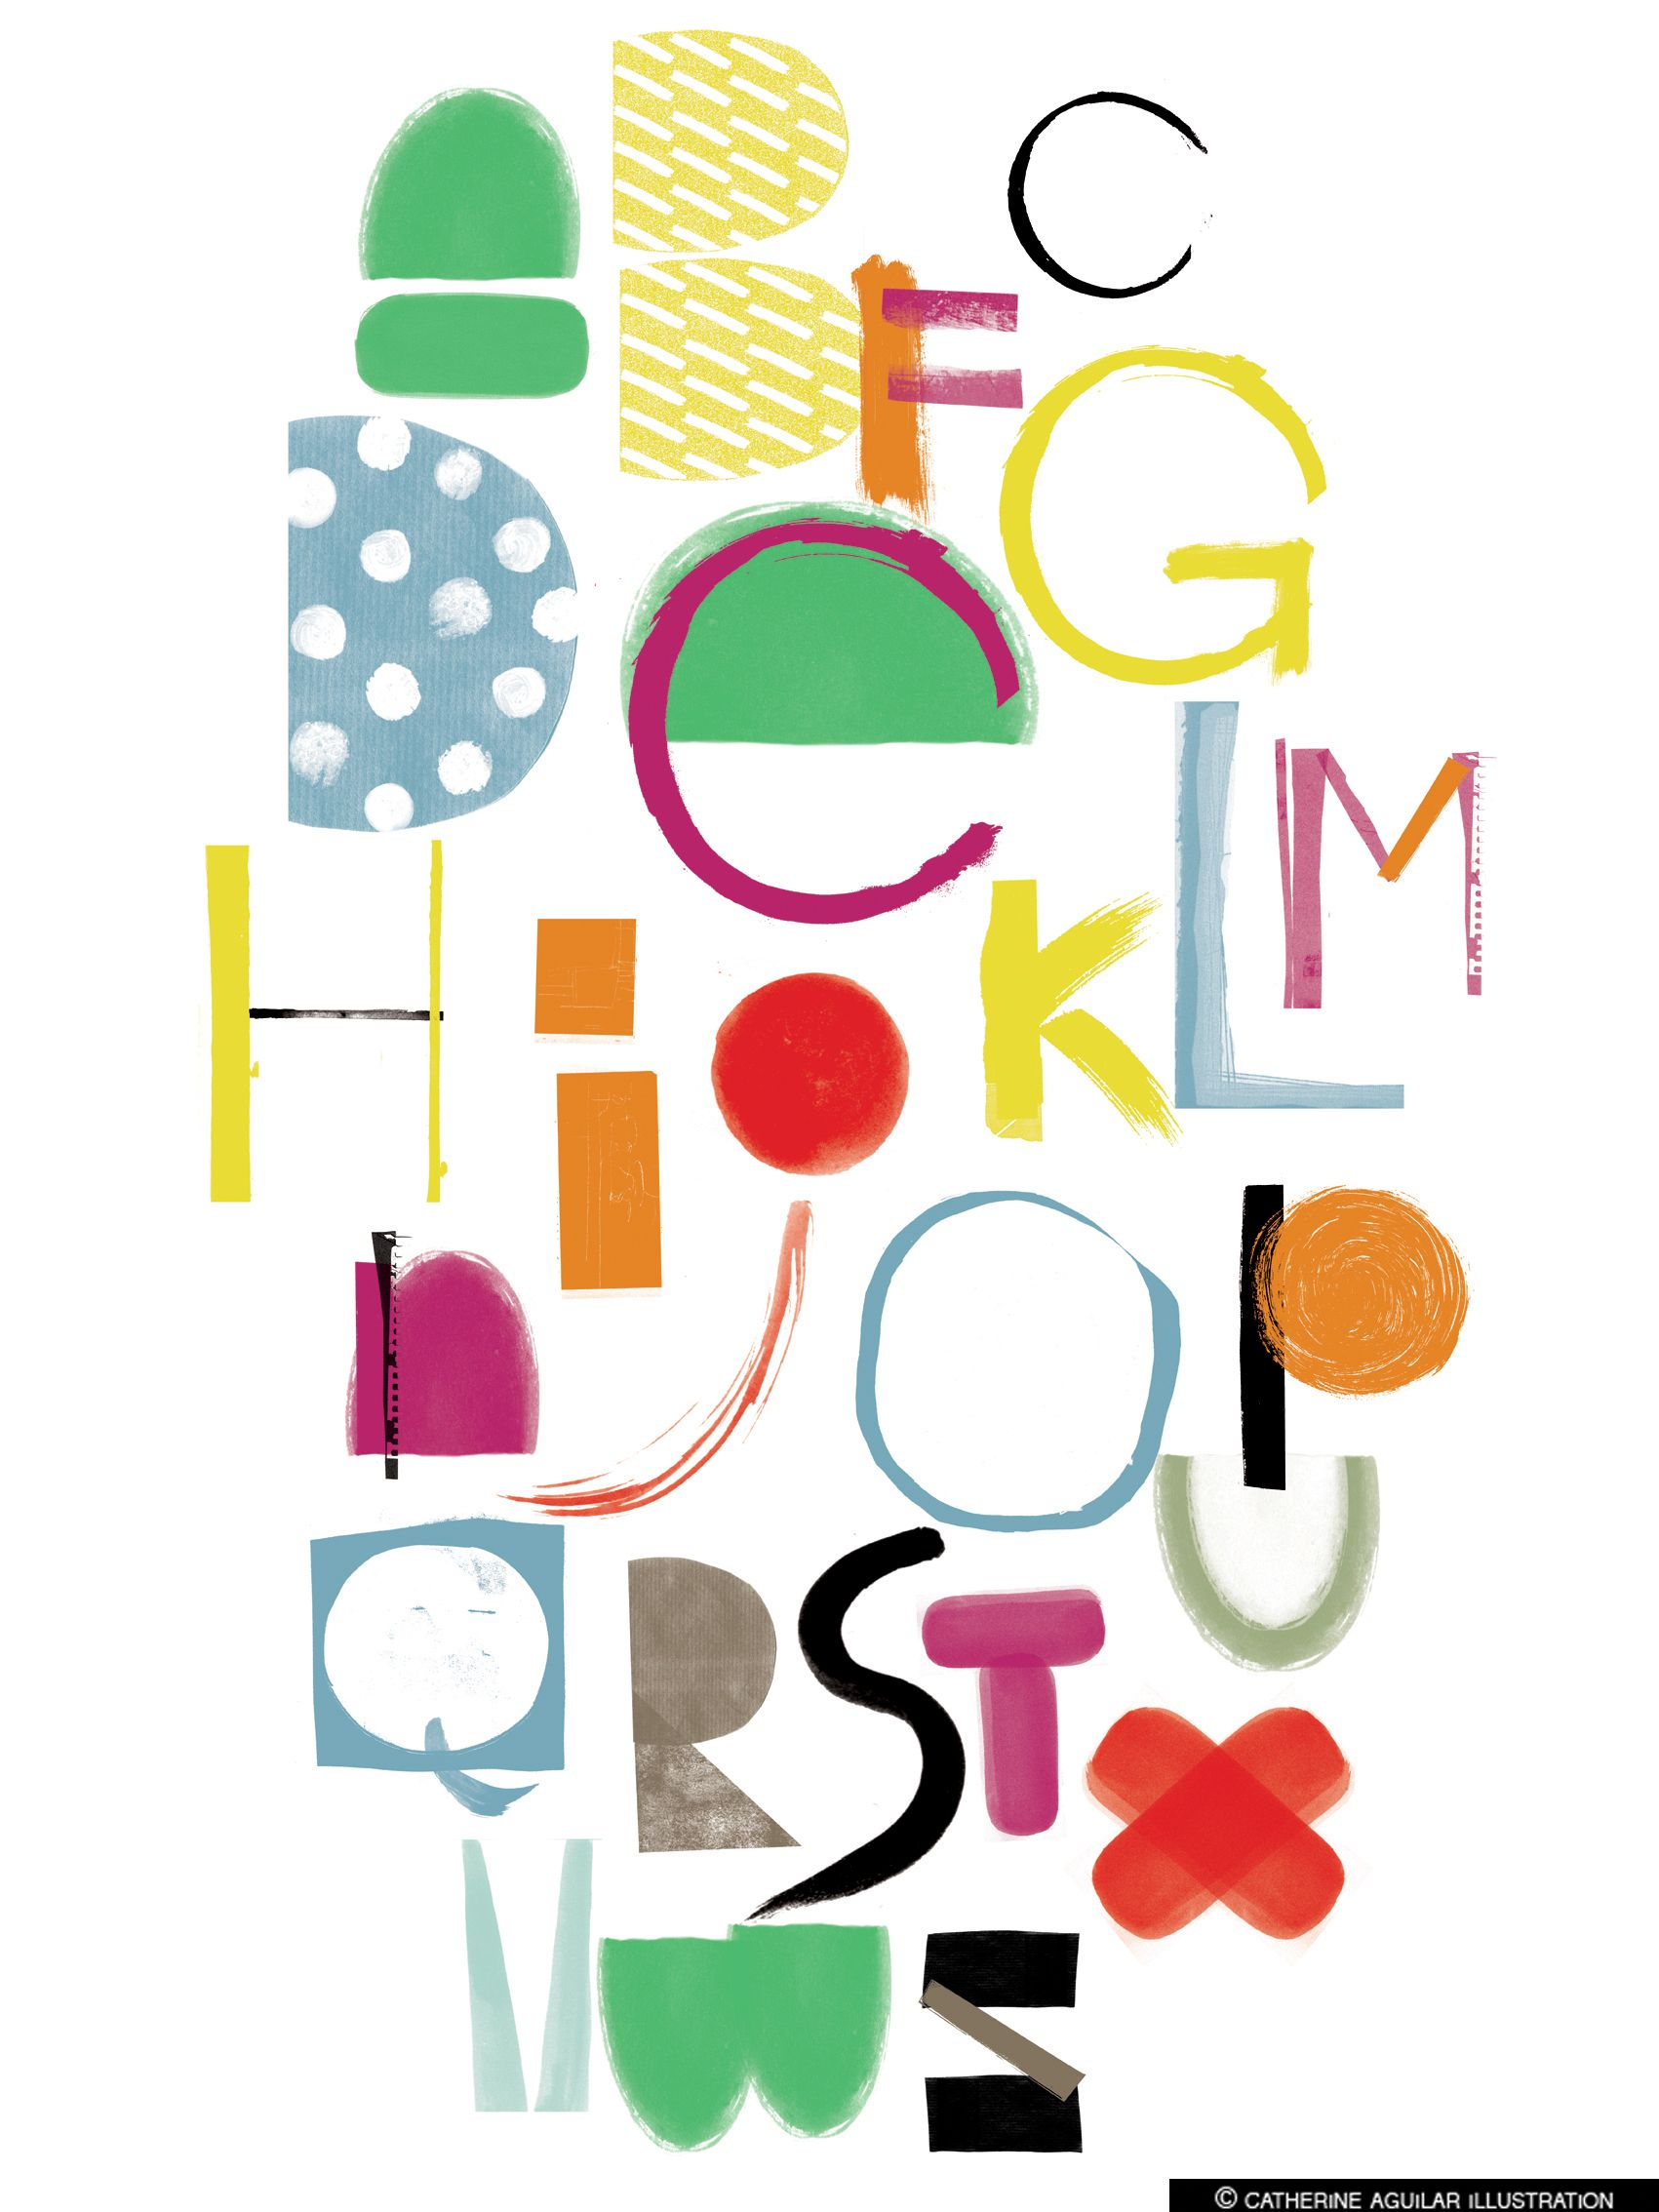 Alphabet Poster Print Painterly Letters Decorative Collage Childrens